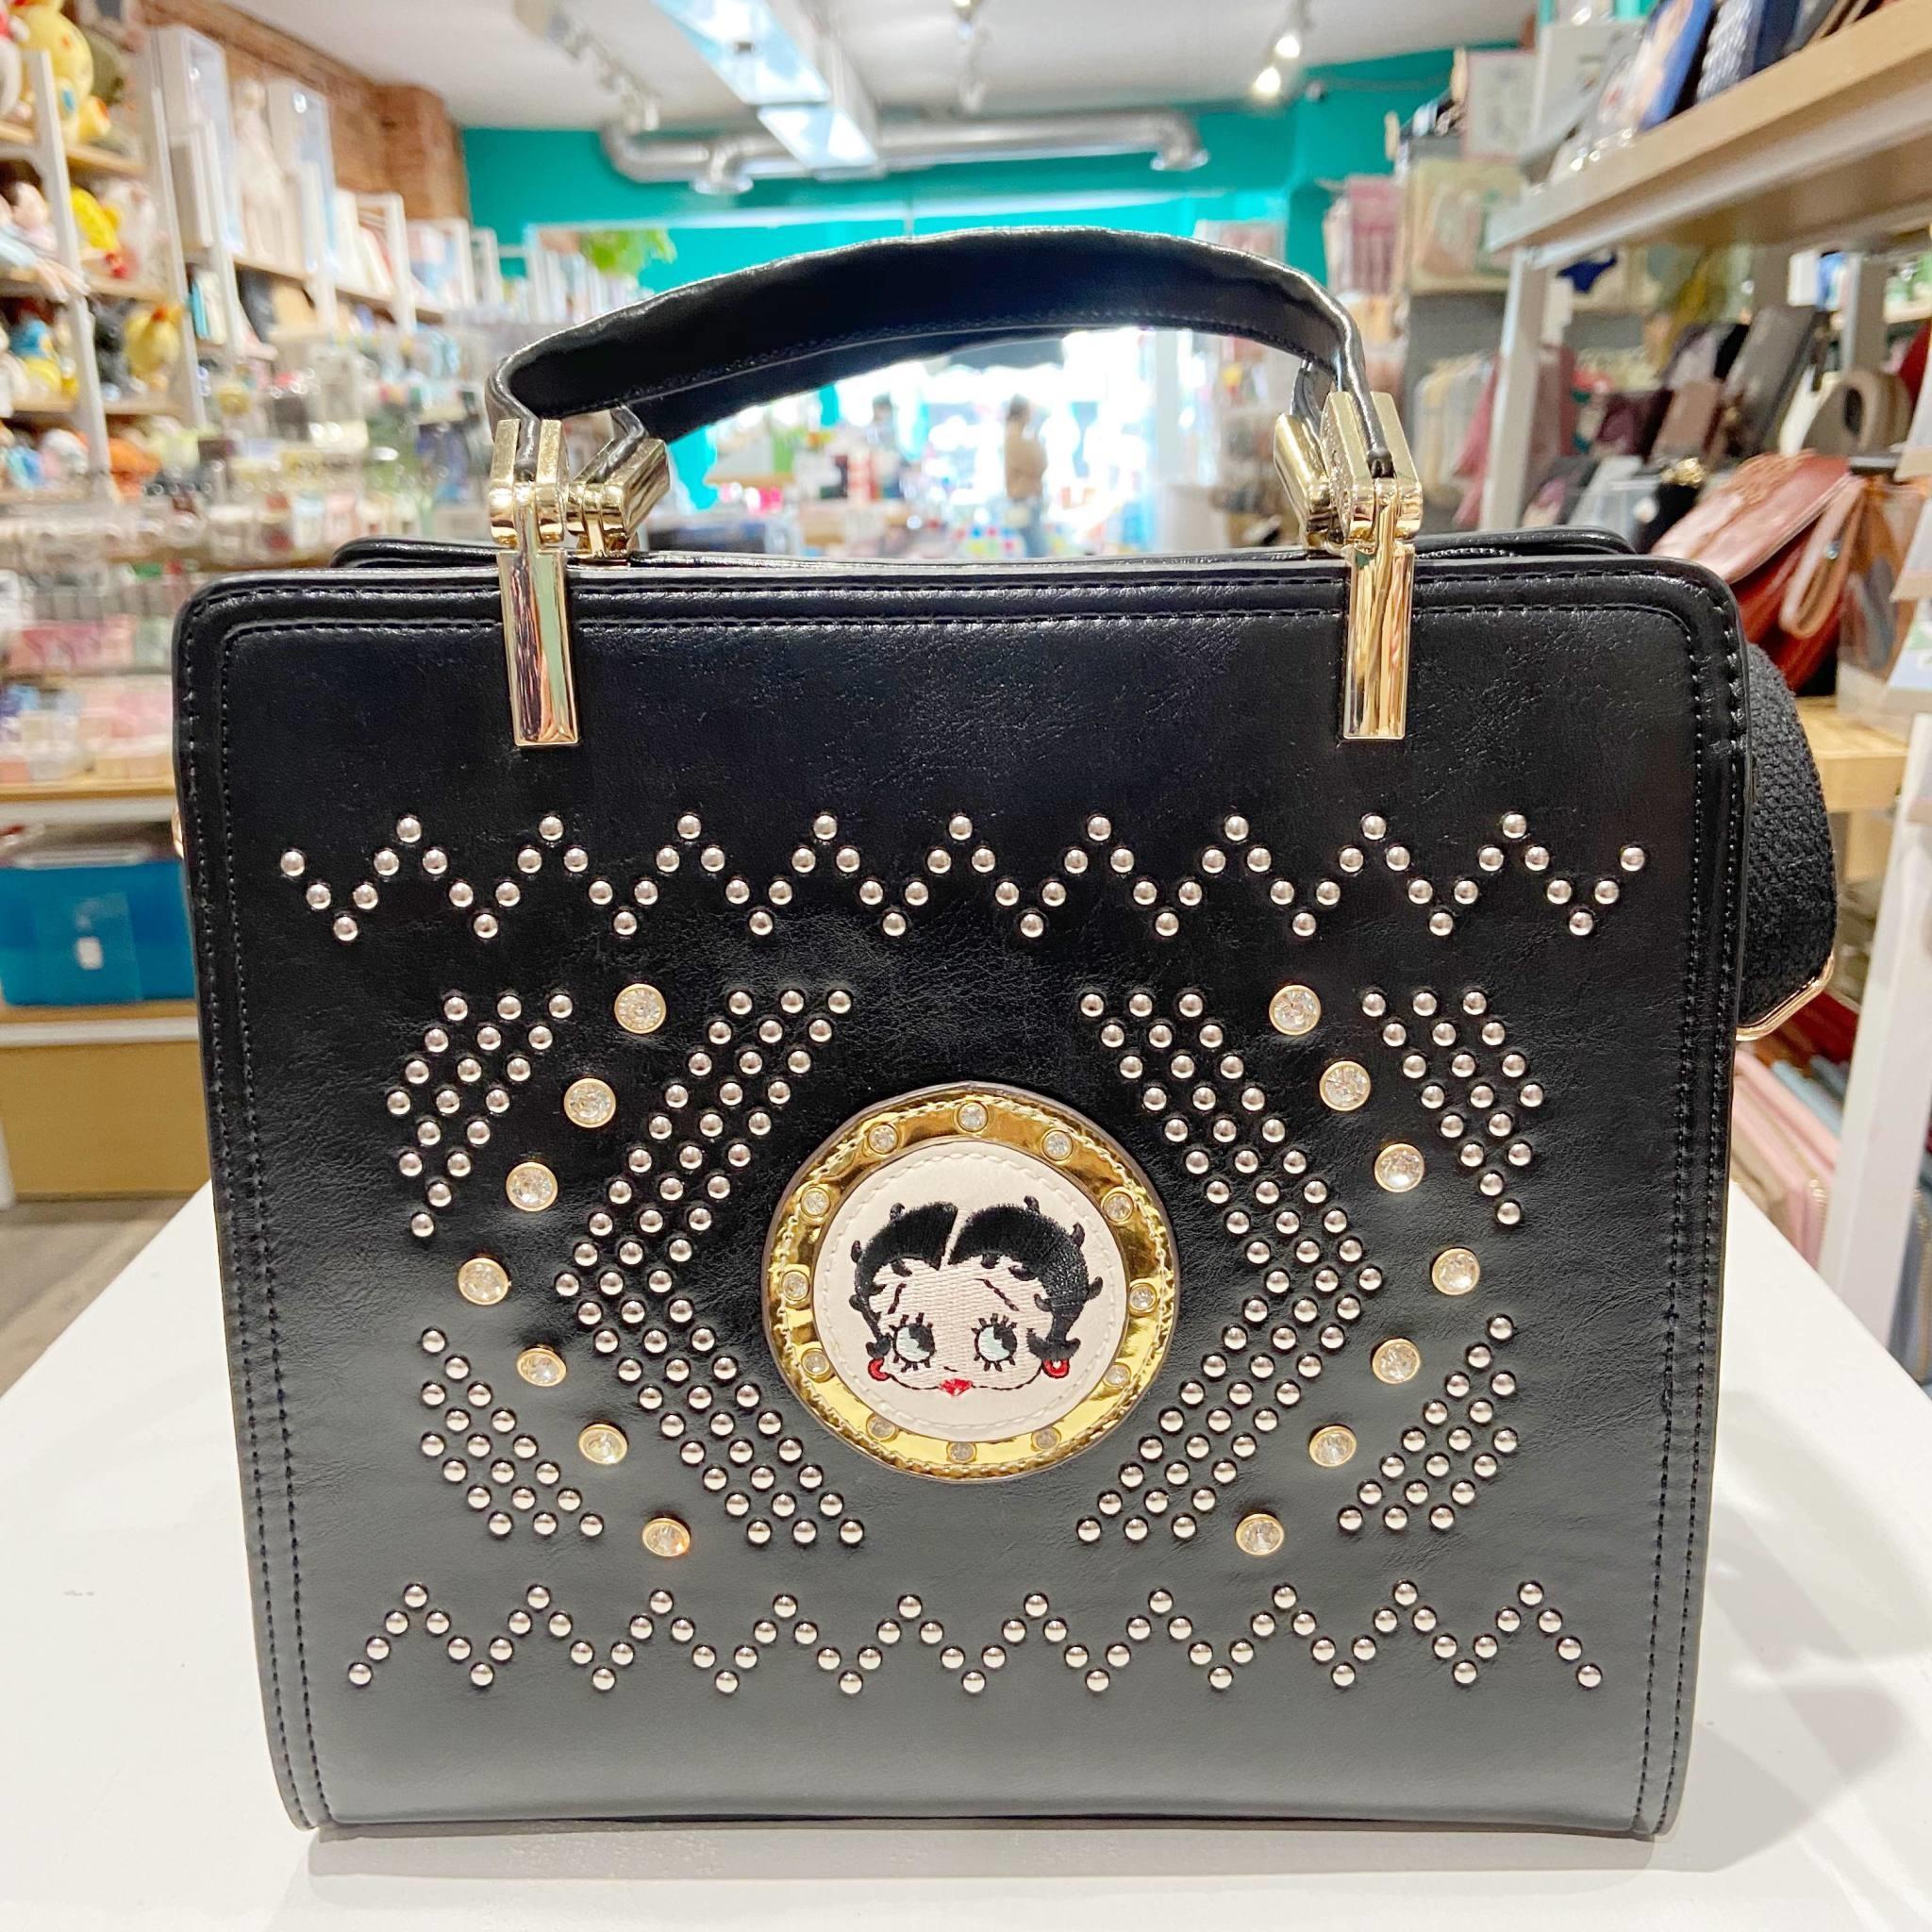 A101120-42 Betty Boop Purse